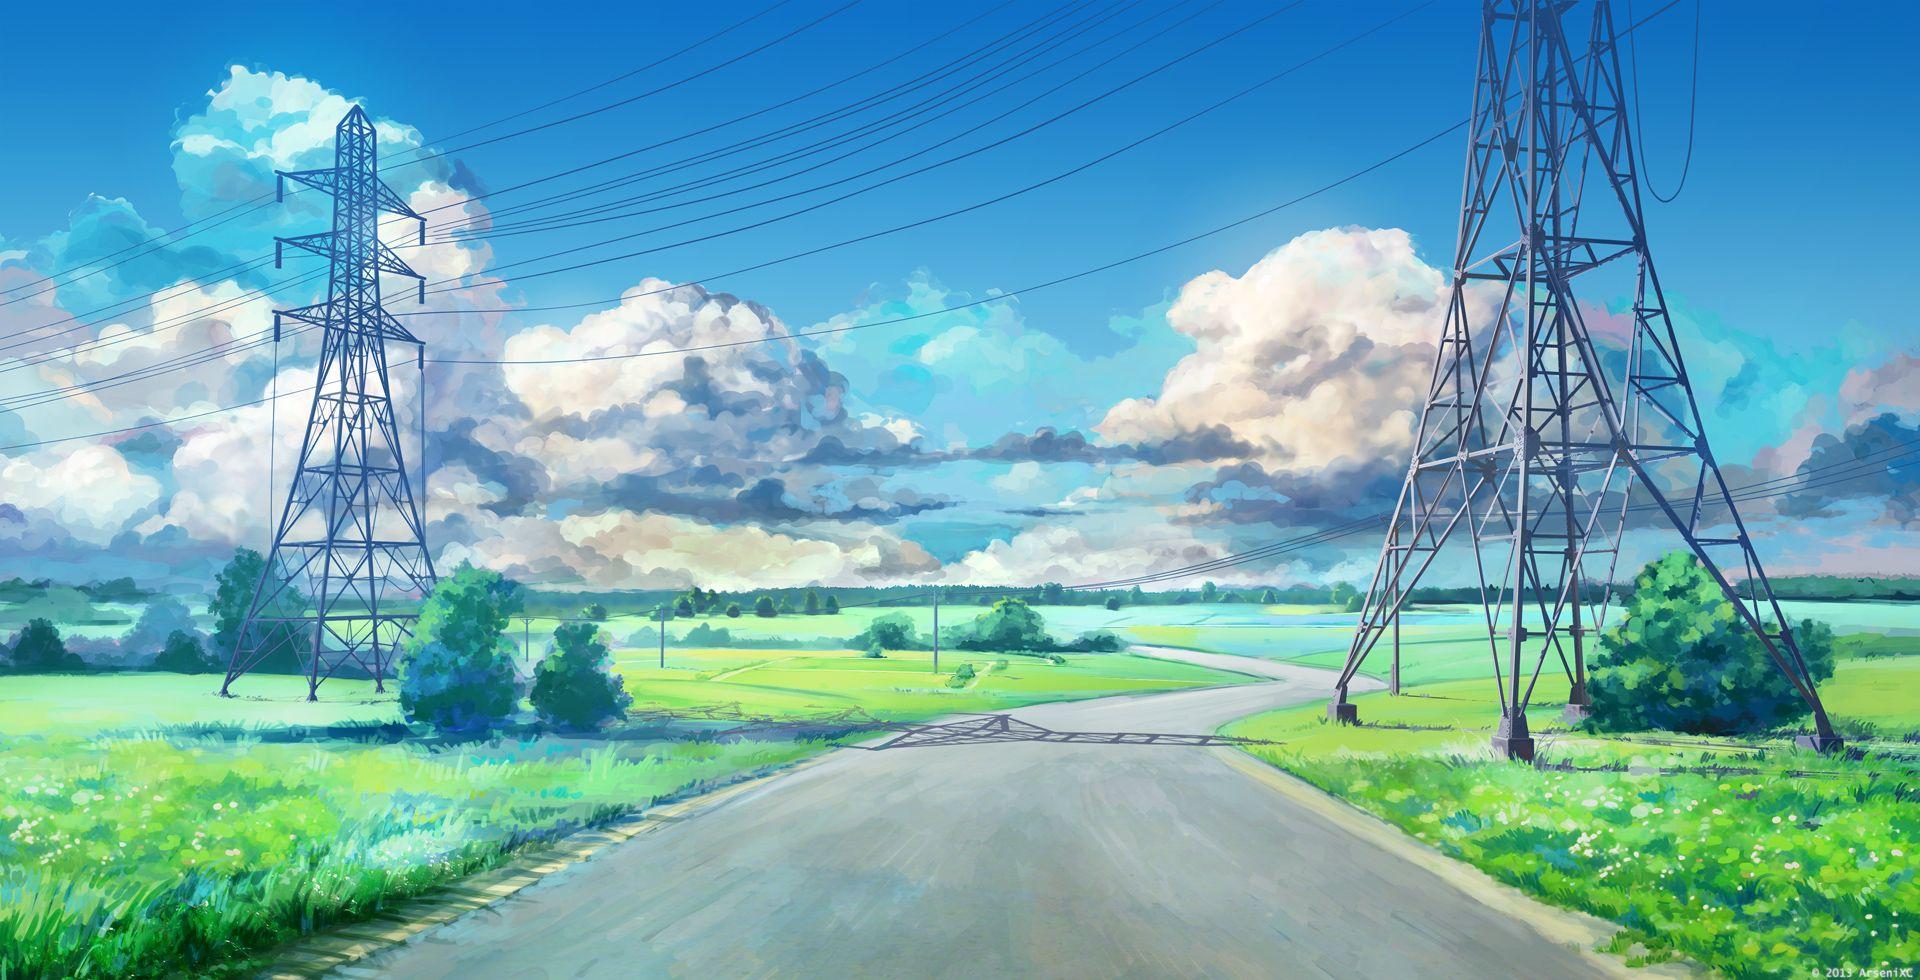 Road By Arsenixc Deviantart Com On Deviantart Anime Scenery